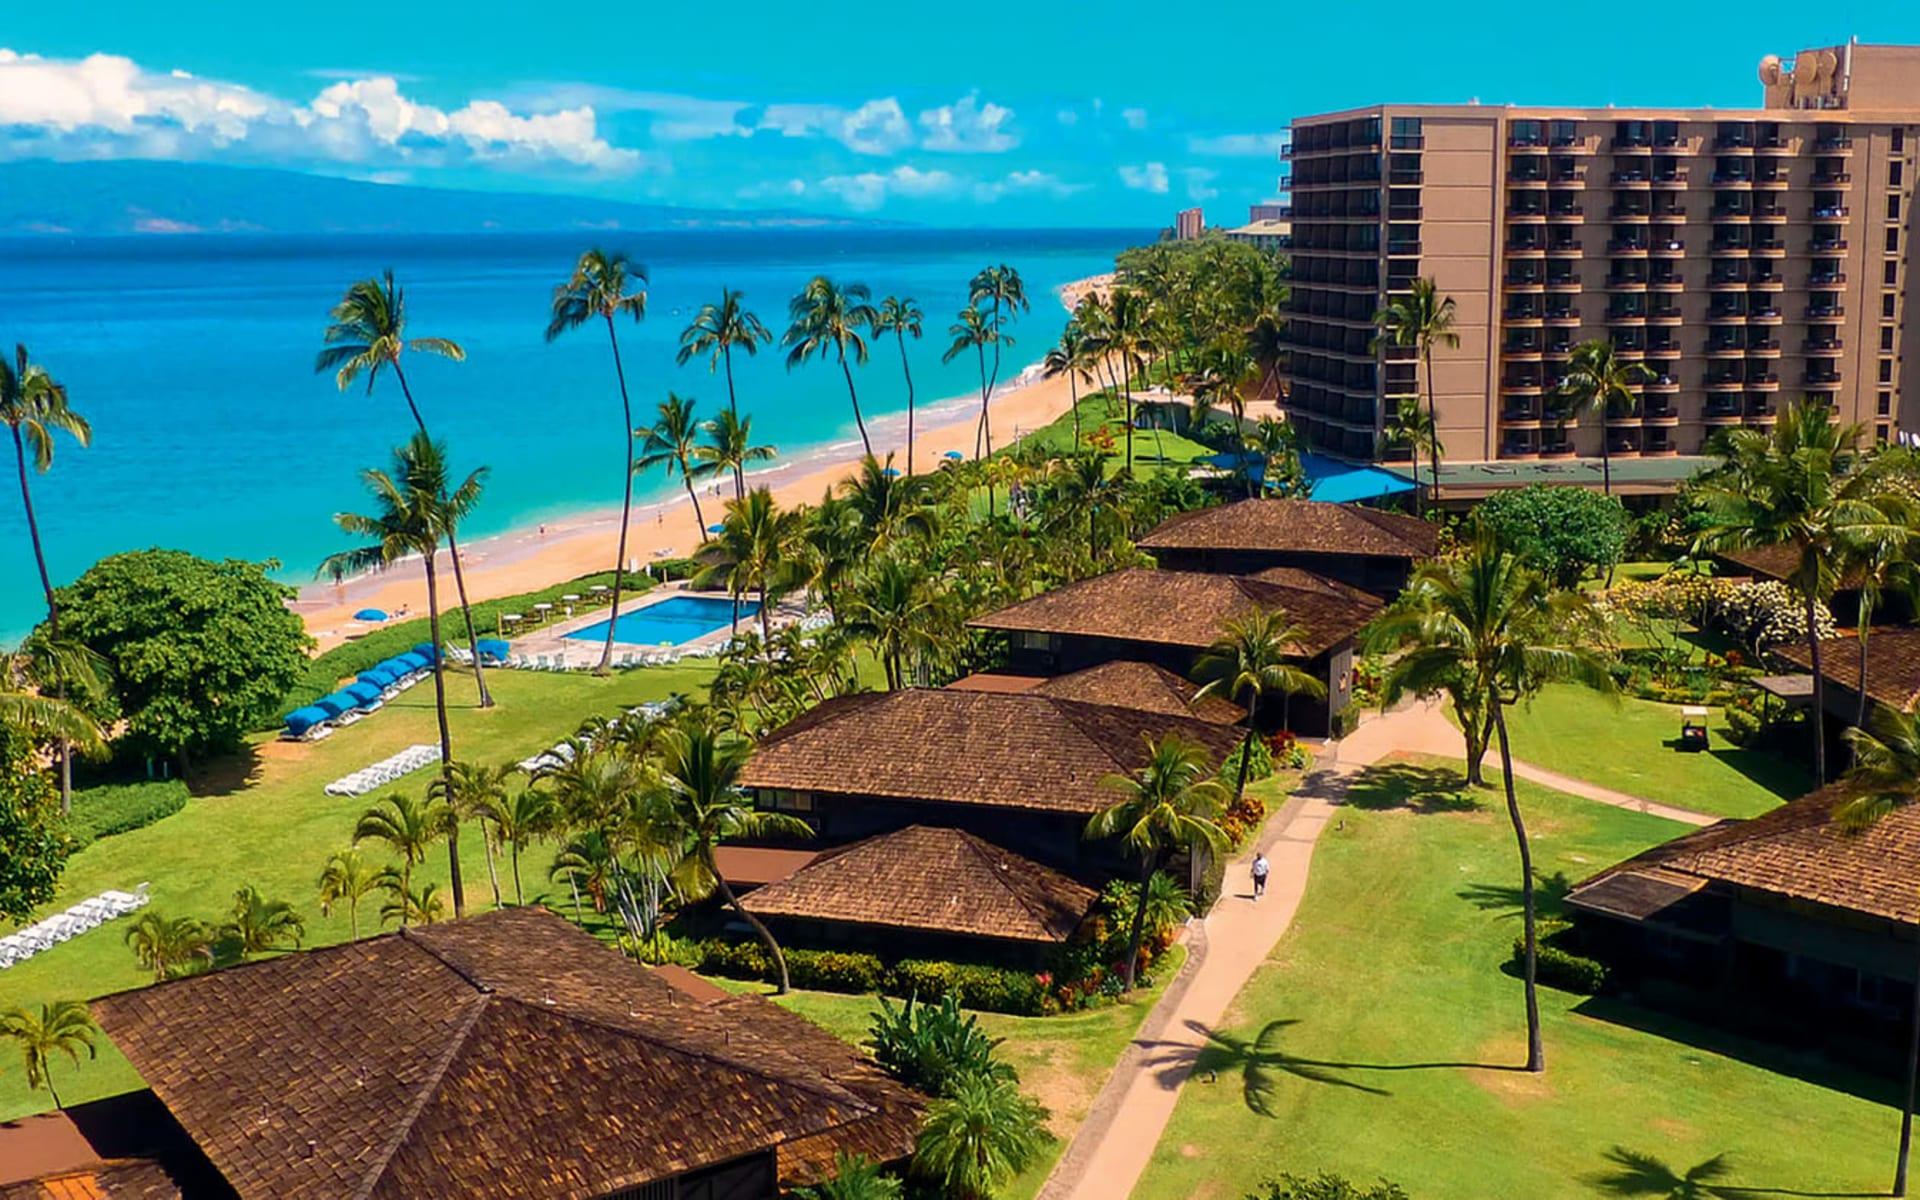 Royal Lahaina Resort in Lahaina - Maui: exterior royal lahaina resort hotelanlage meer garten